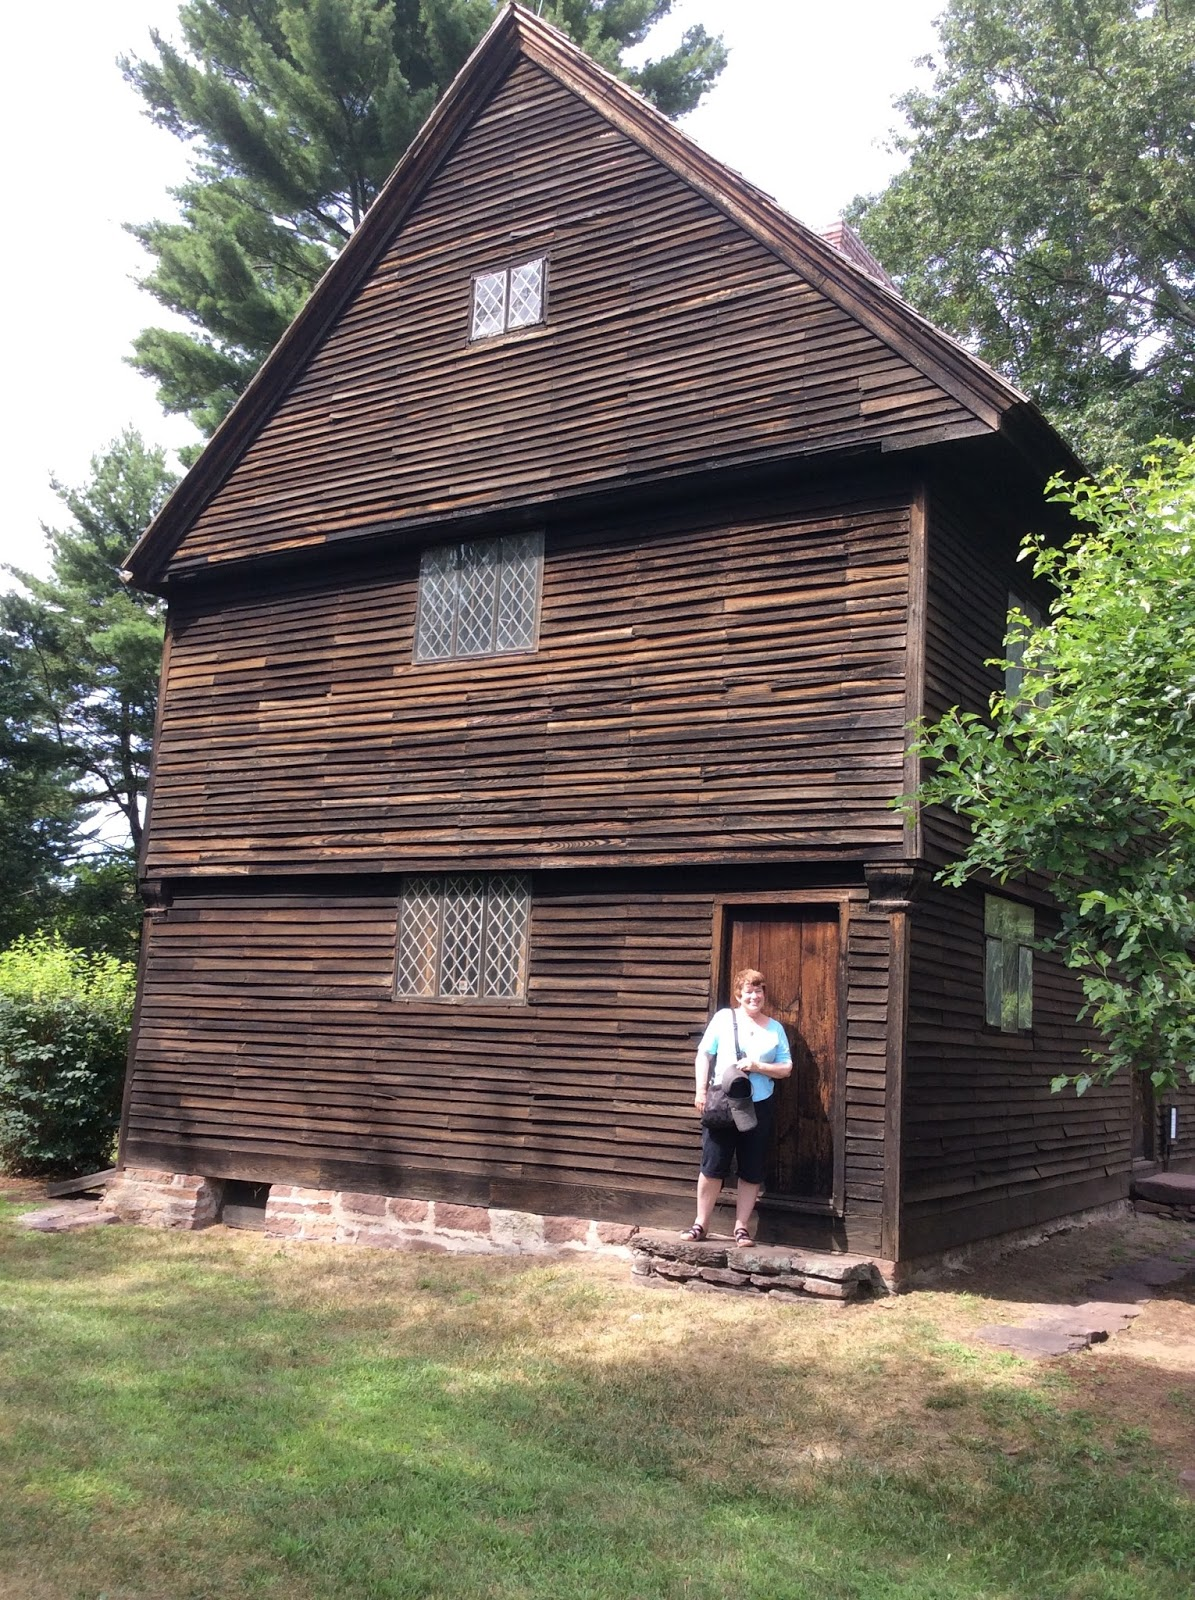 Dorothea Jensen S Blog The Witch Of Blackbird Pond Revisited